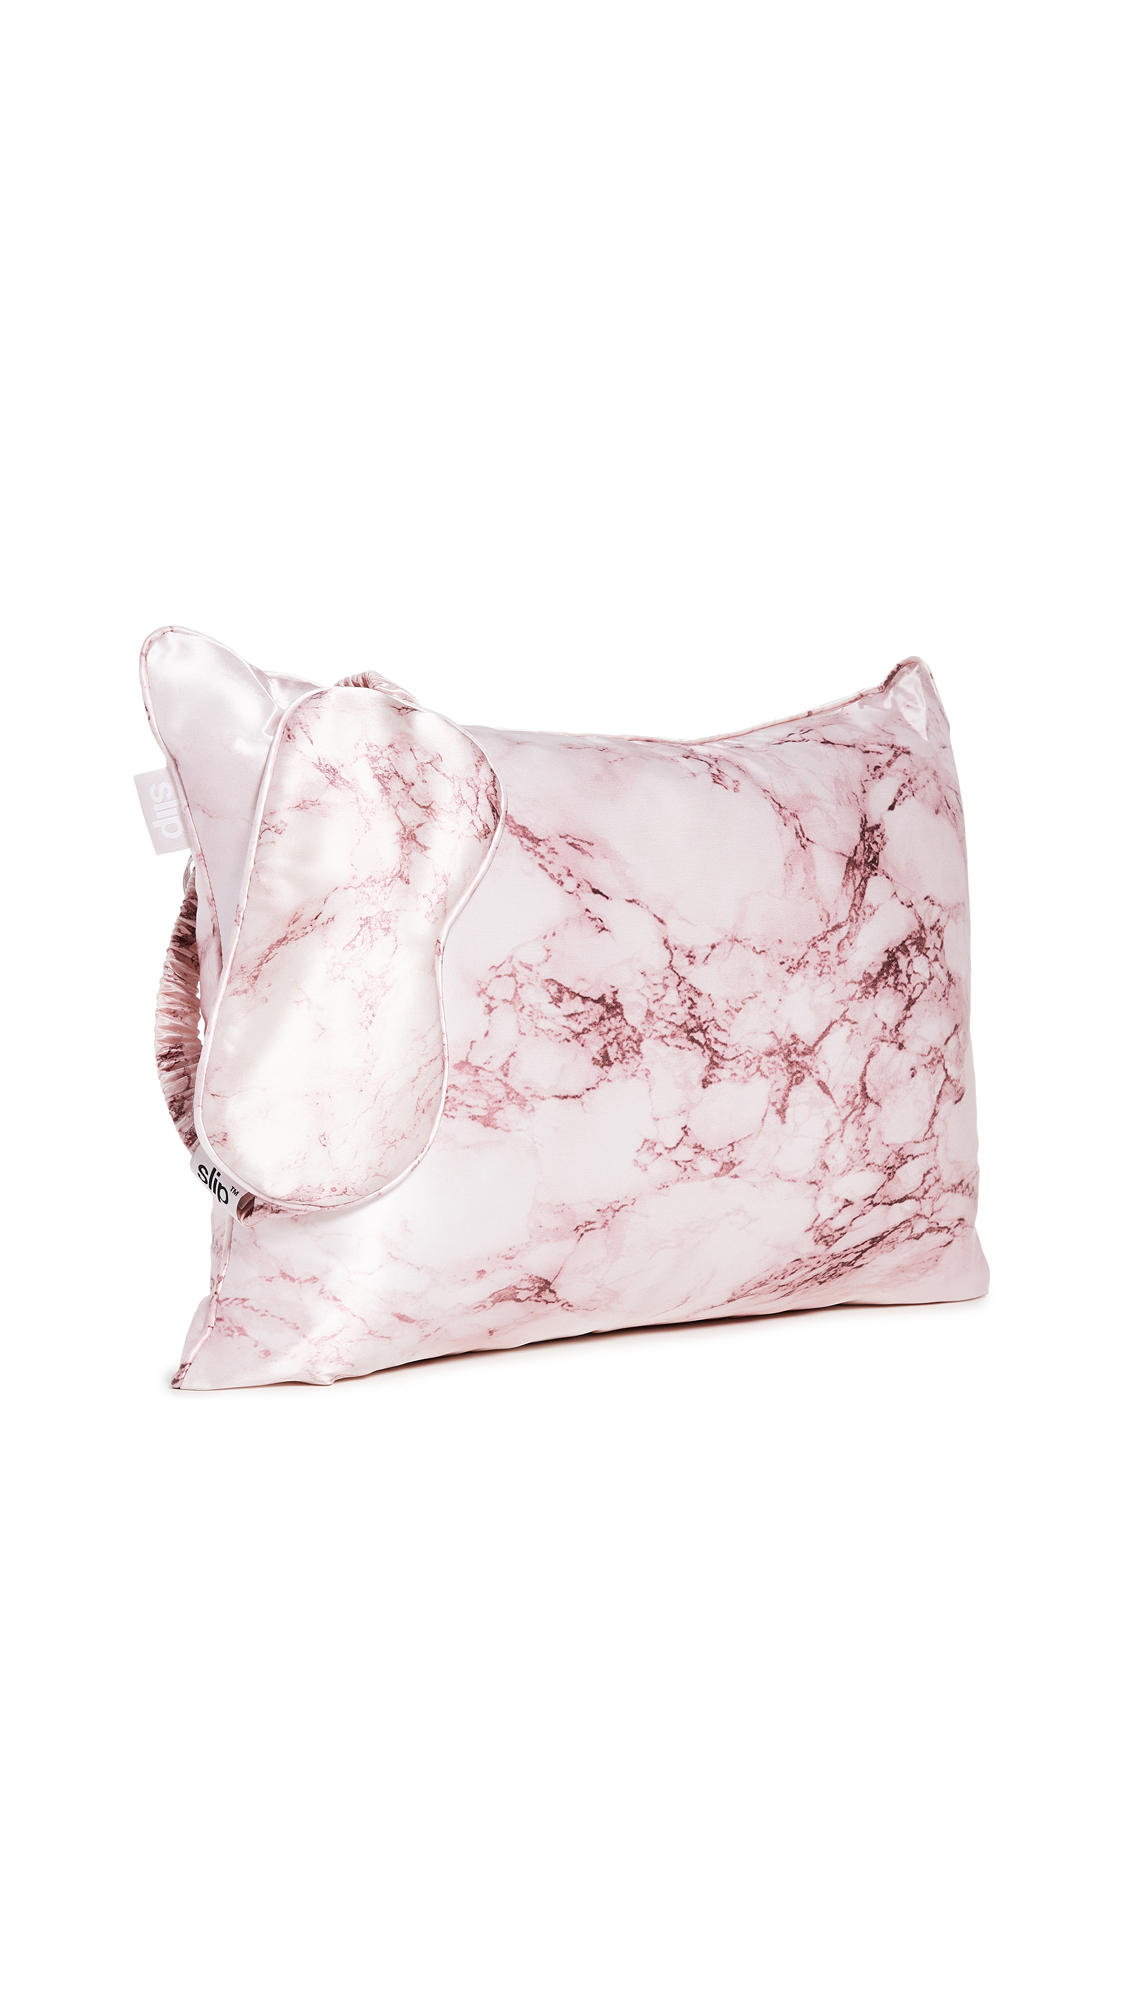 Slip Pink Marble Travel Set